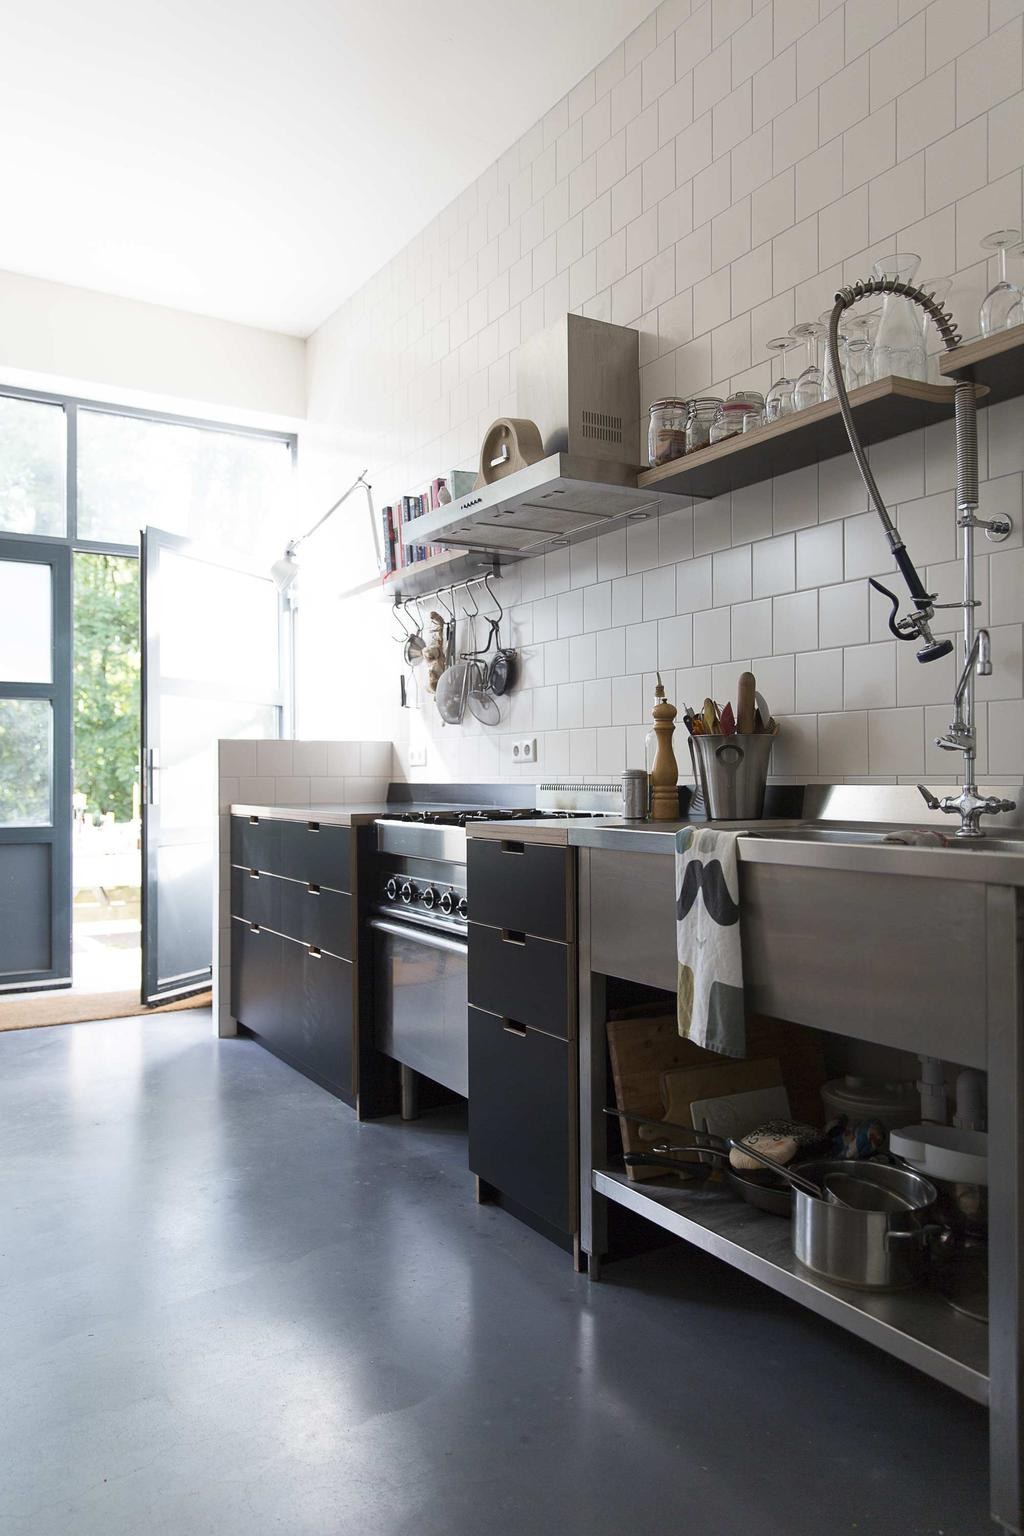 keuken betonnen vloer